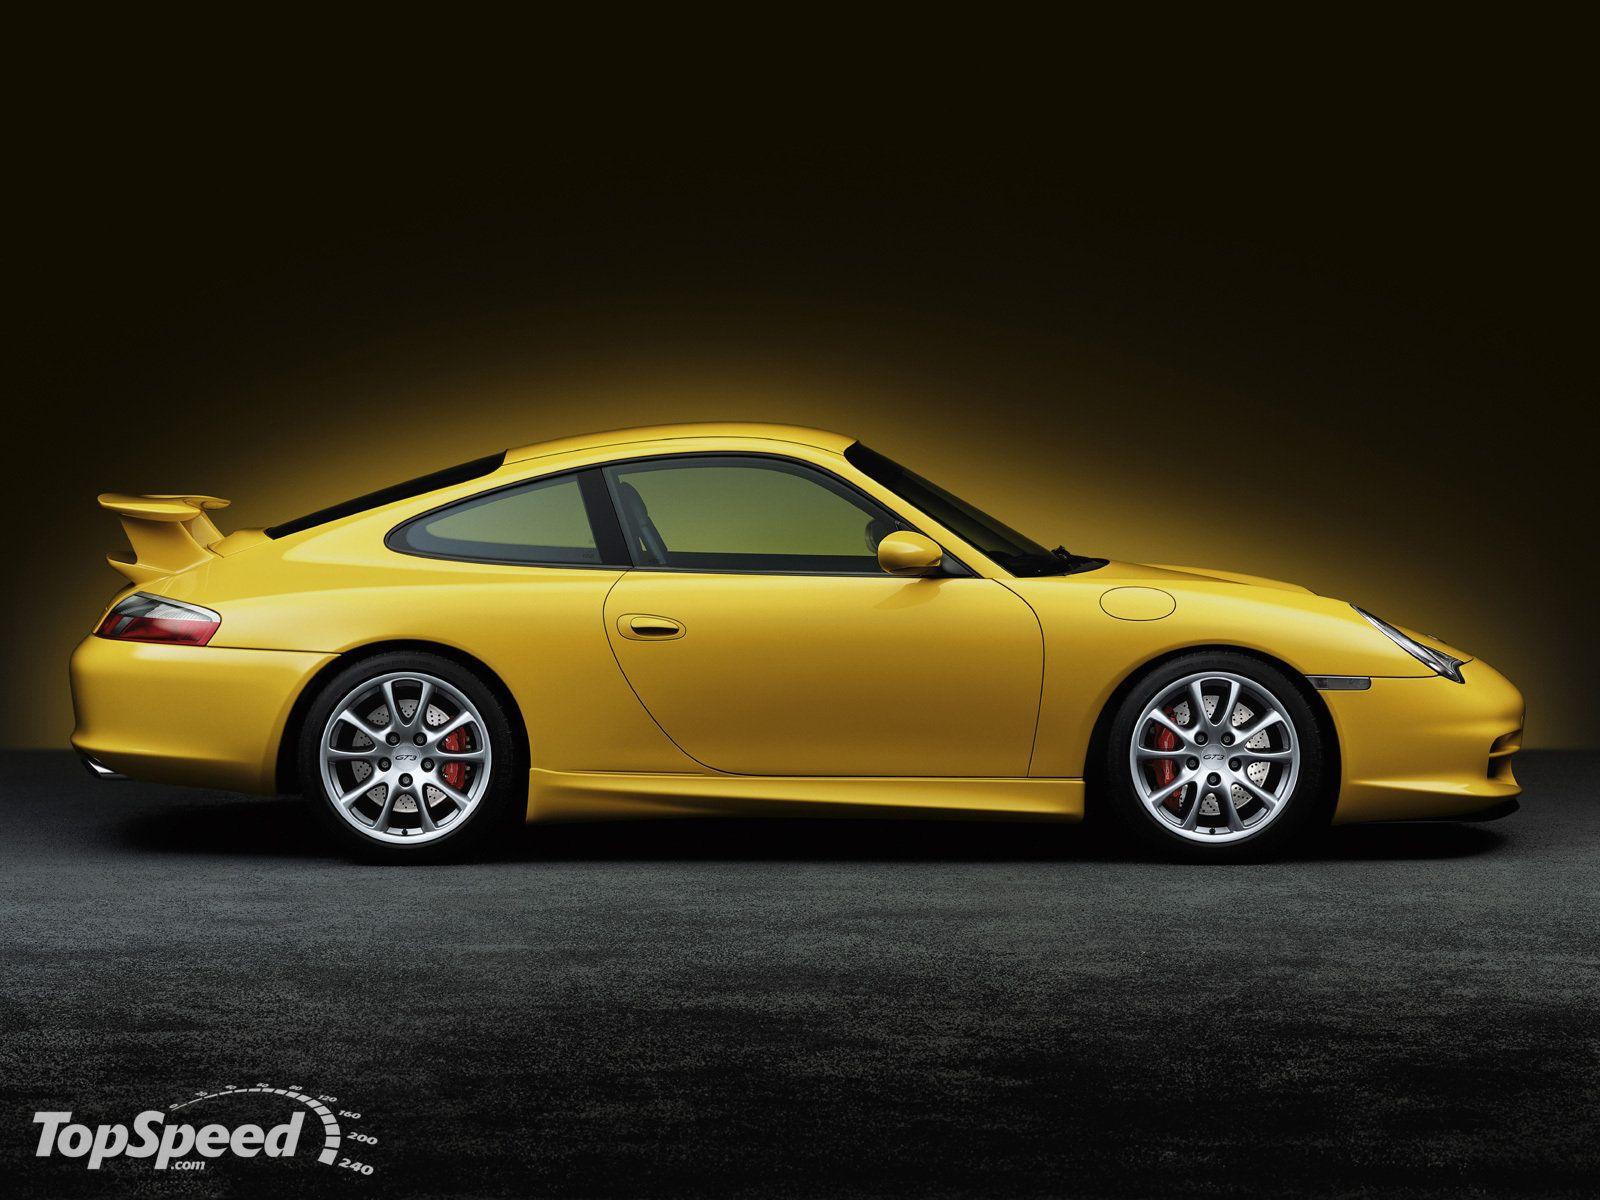 eab35136770382aeca99ccffa3cf29e6 Stunning Porsche 911 Gt2 Body Kit Cars Trend